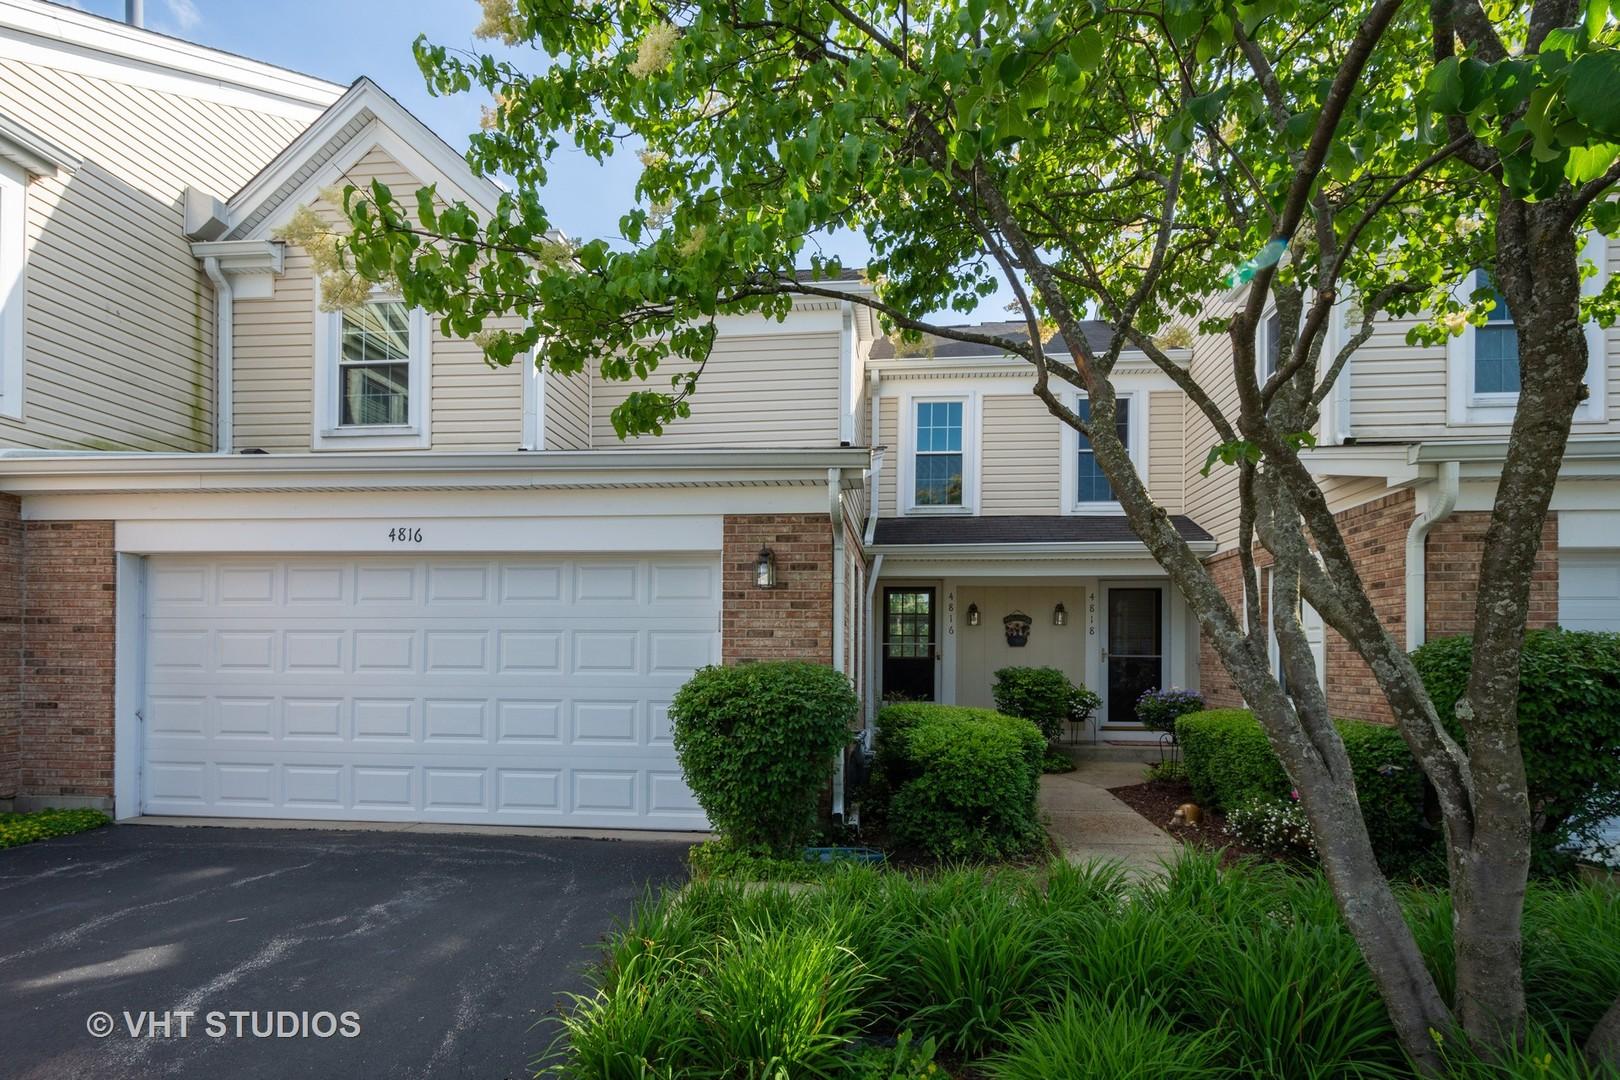 4816 Prestwick ,Hoffman Estates, Illinois 60010